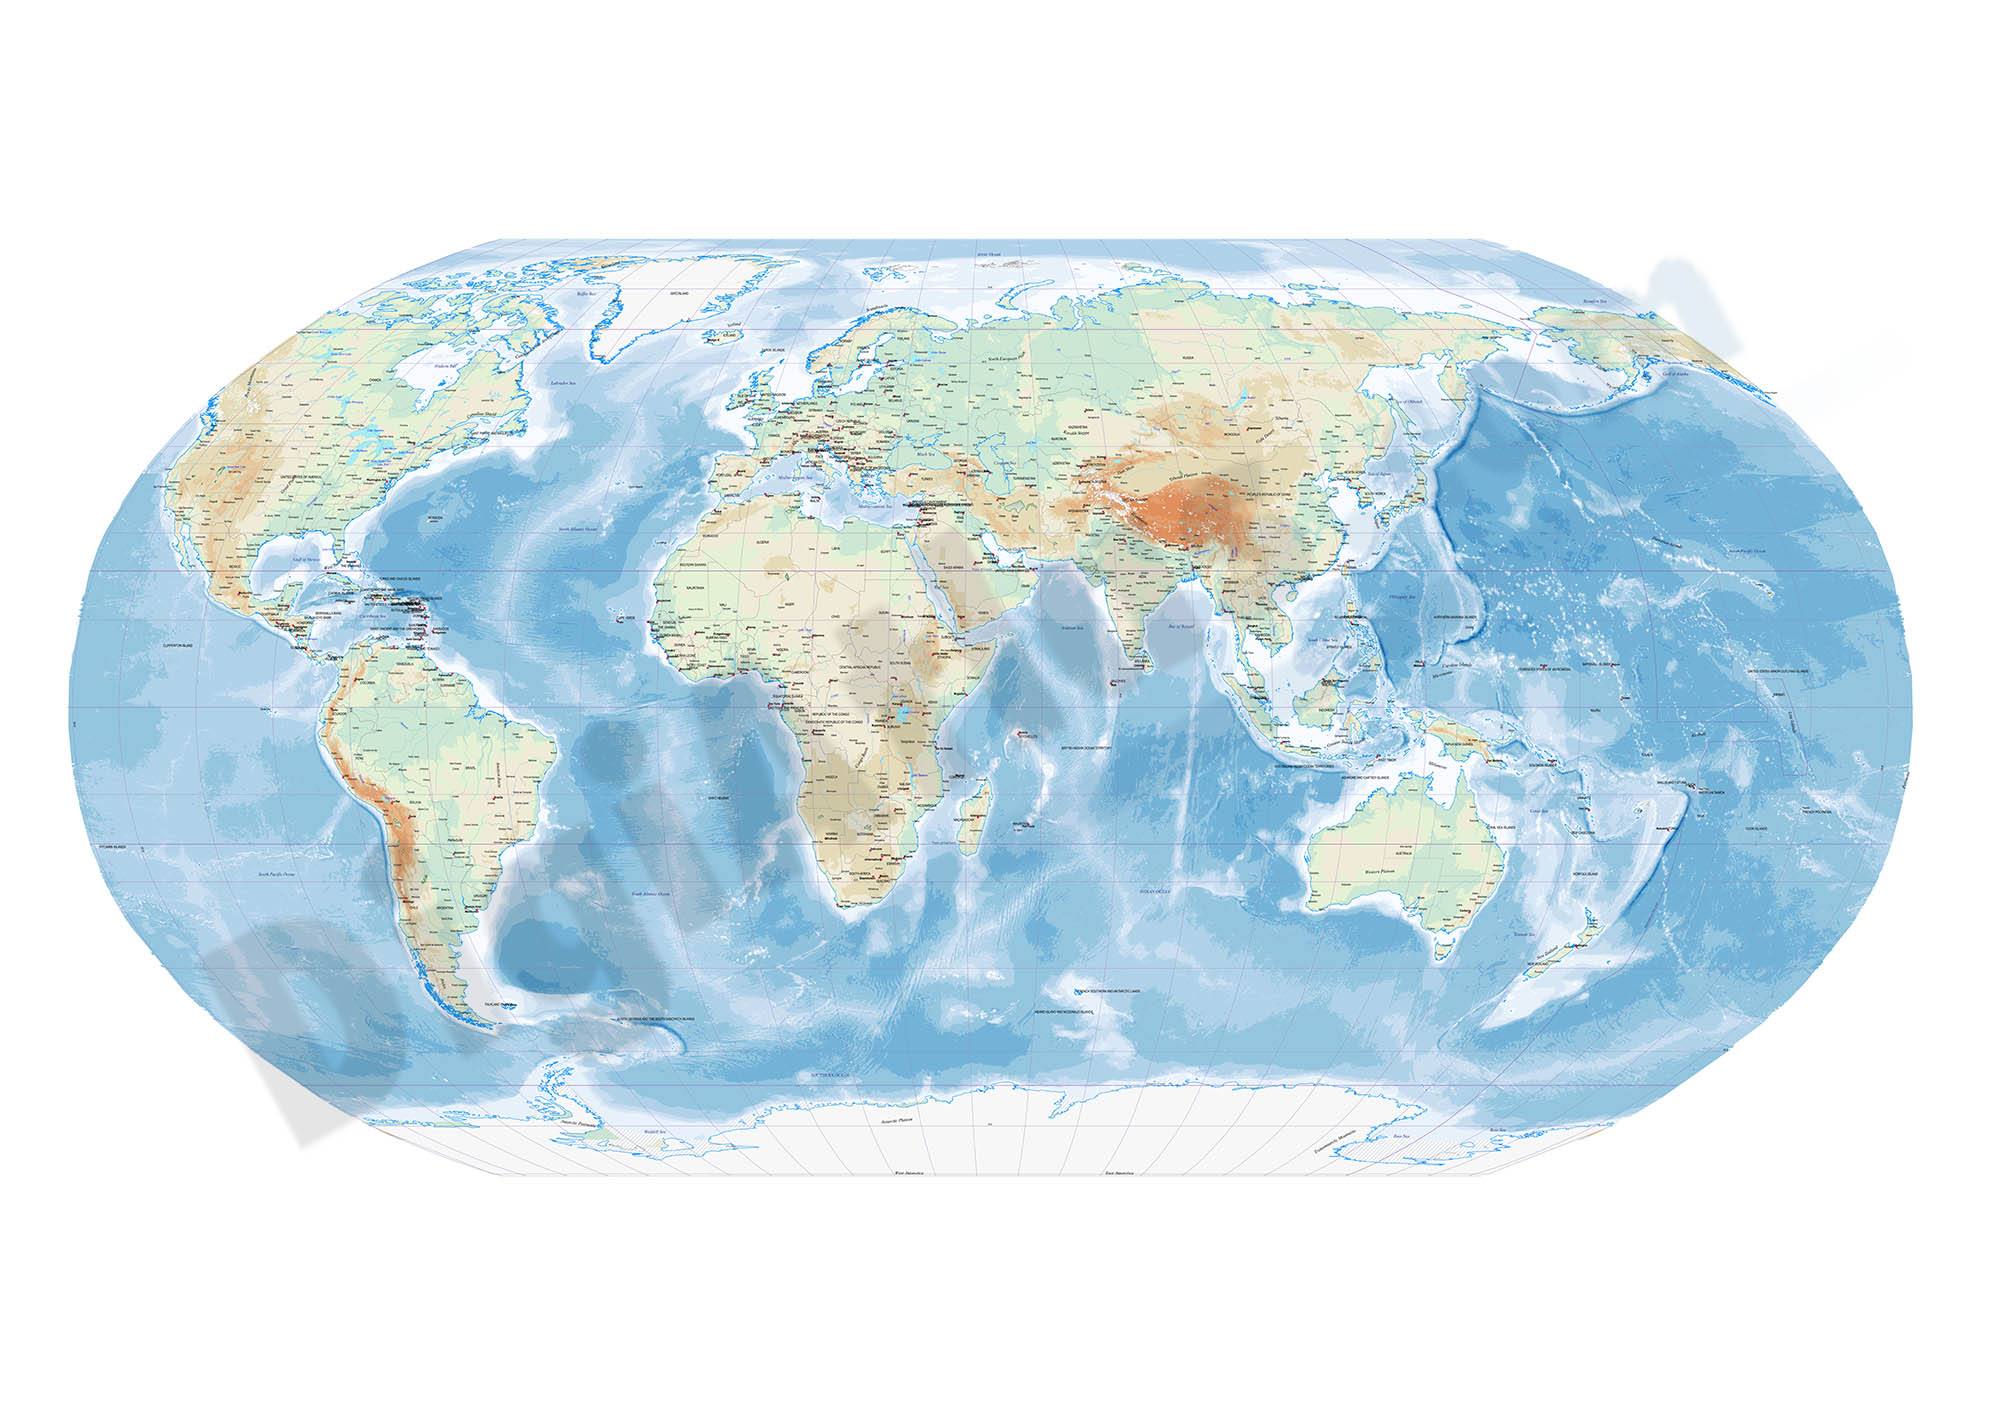 Robinson projected Worldmap centered in Bahrain